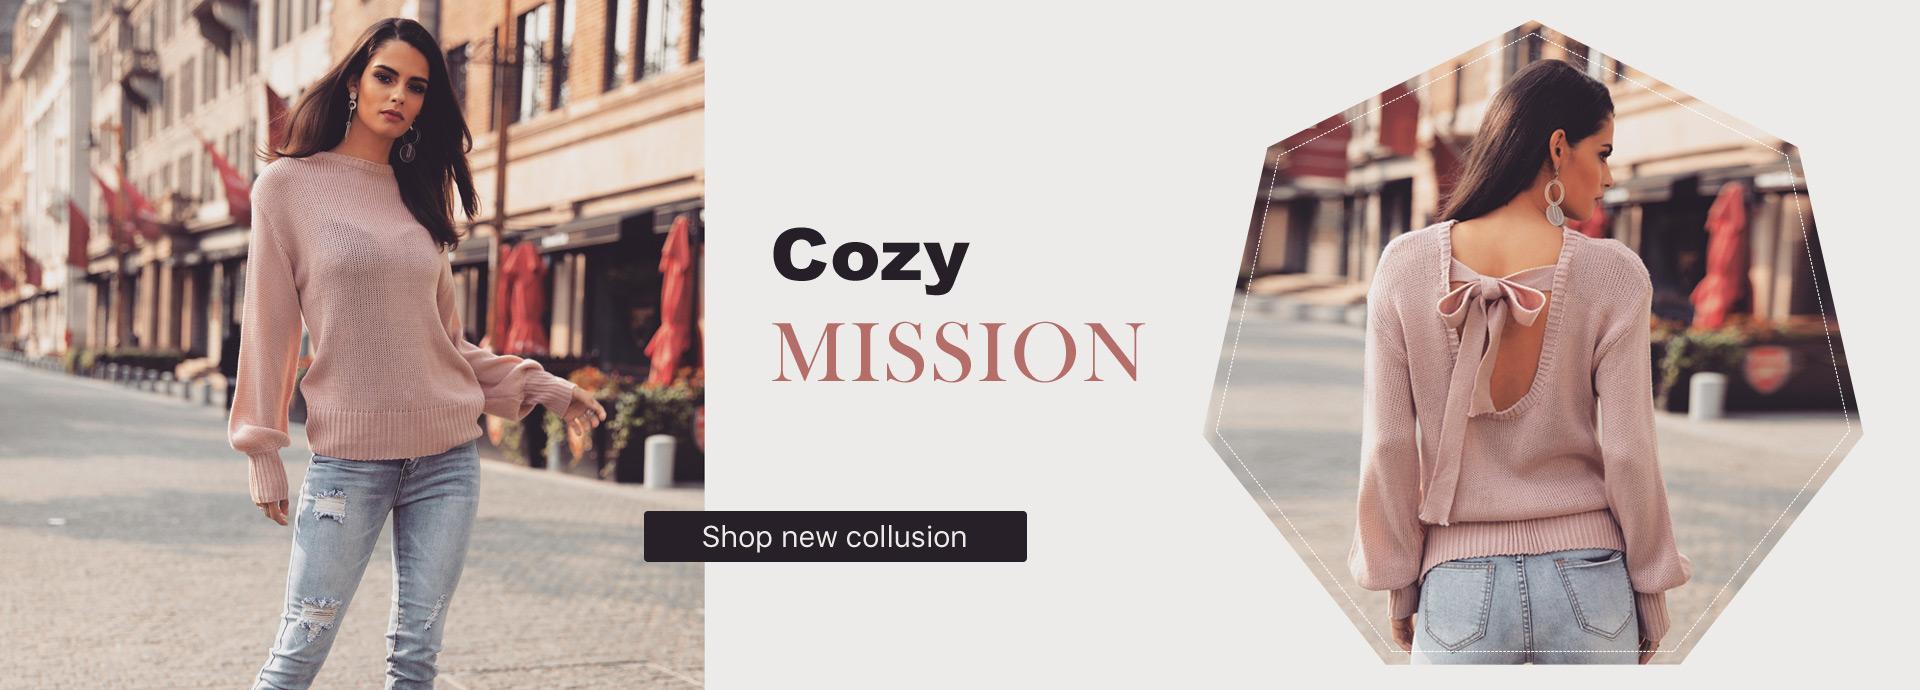 Cozy MISSION